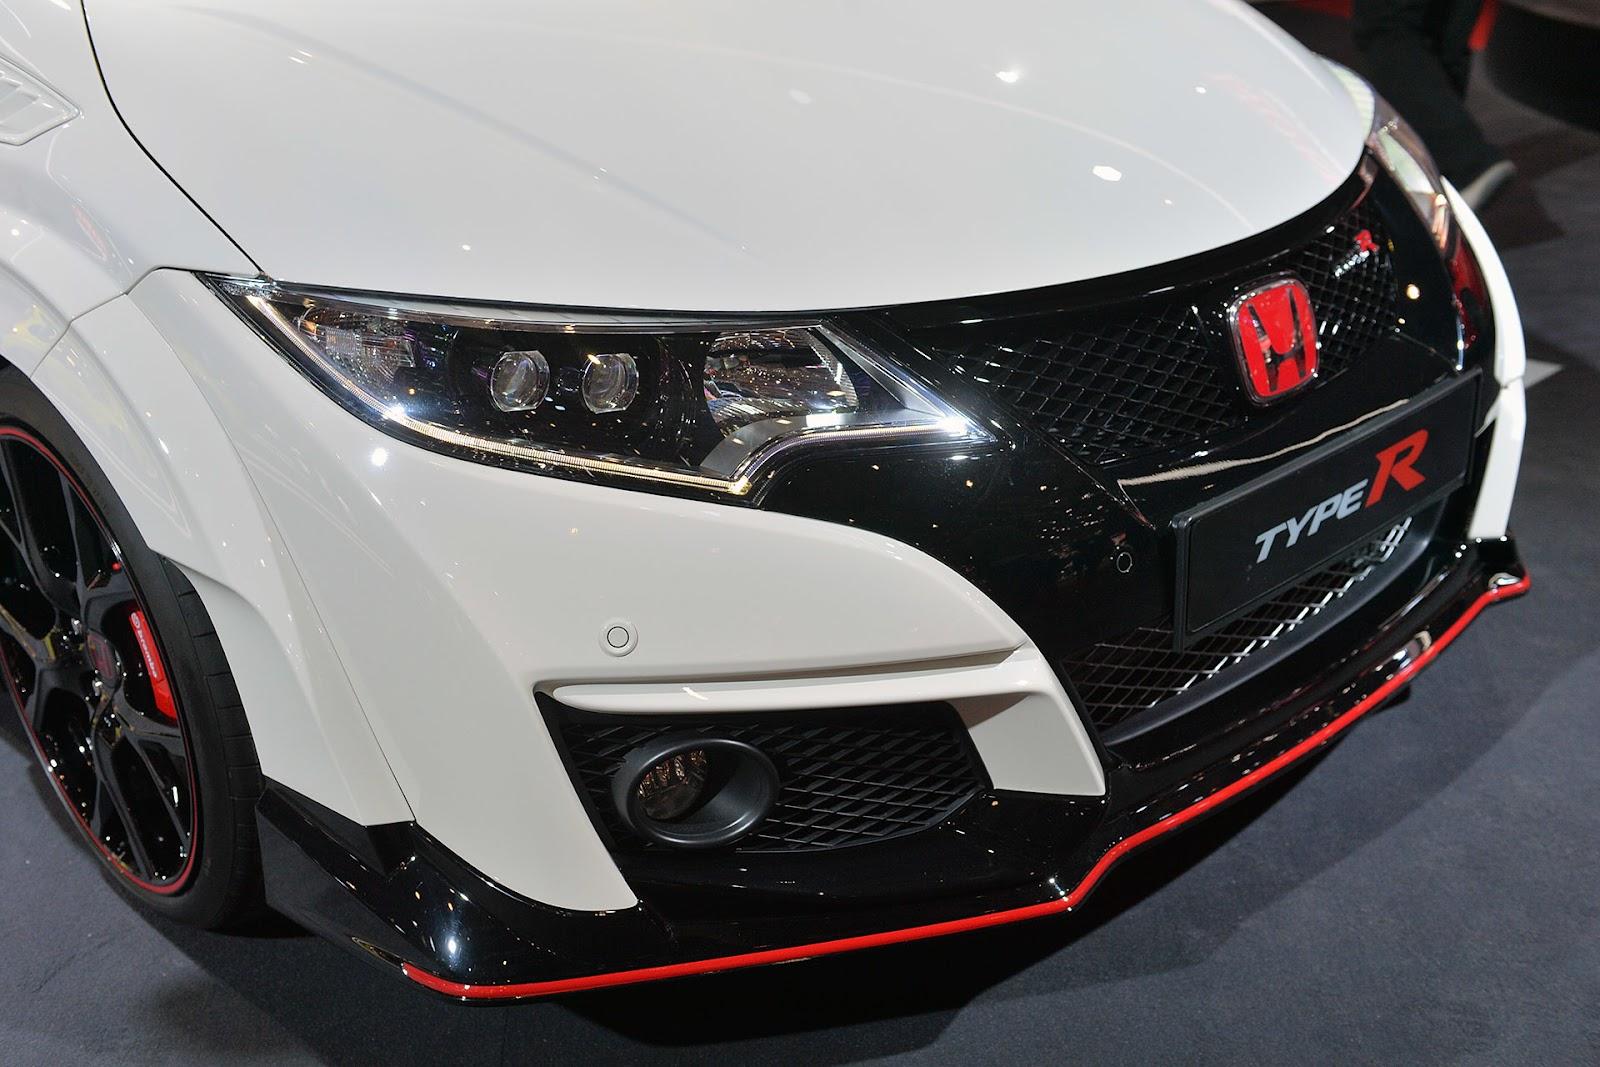 2016 honda civic type rdan pist rekoru turkeycarblog for Honda civic type r 2016 price